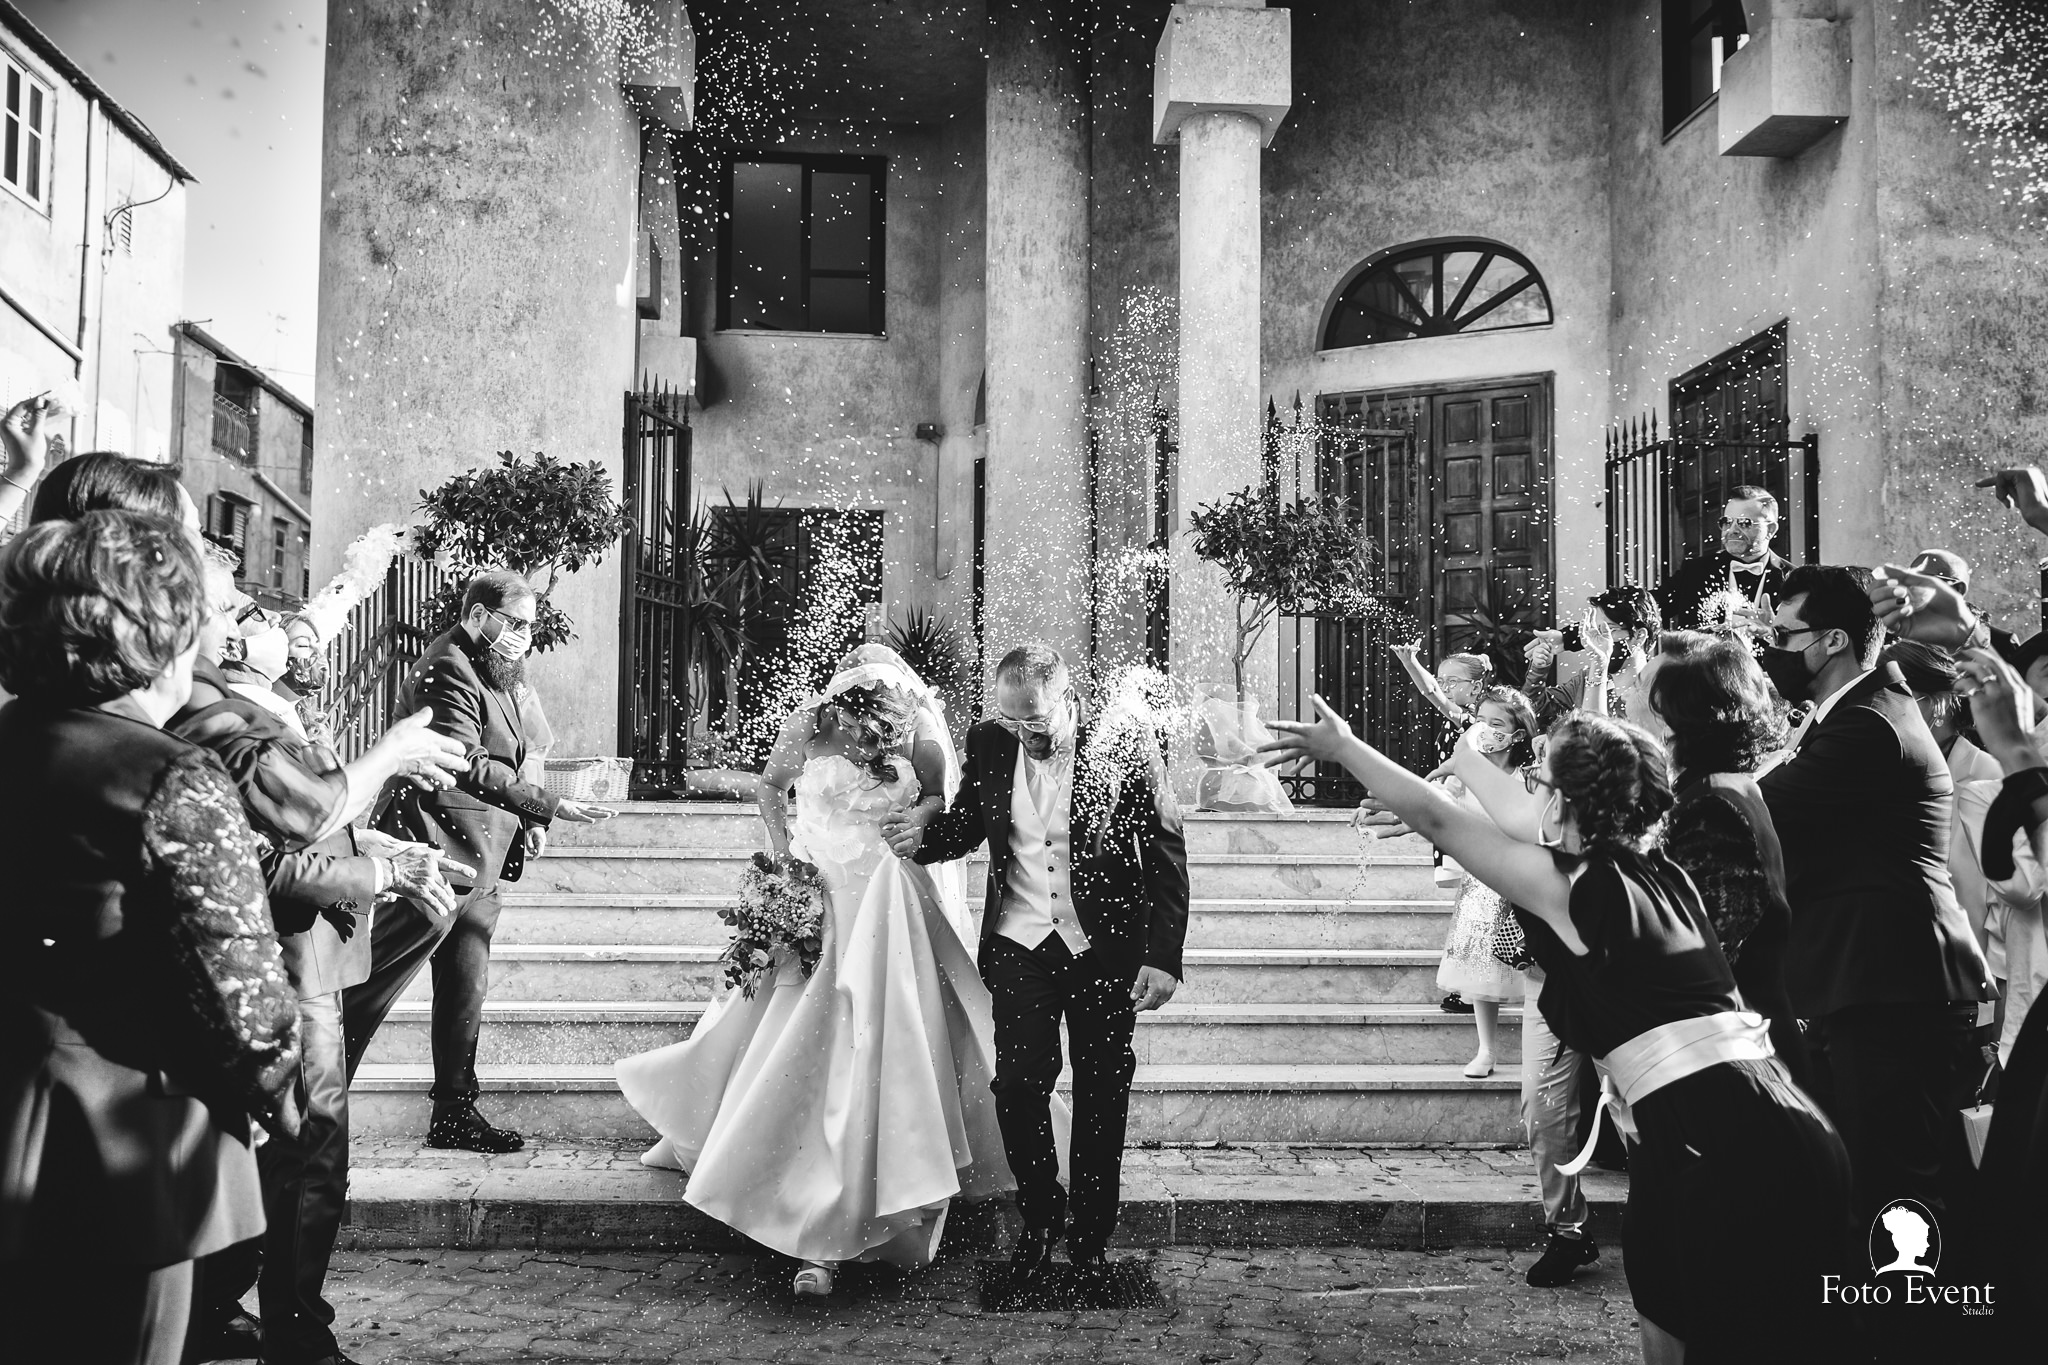 042-2020-10-15-Matrimonio-Noemi-e-Salvatore-Paterno-5DE-1636-Edit